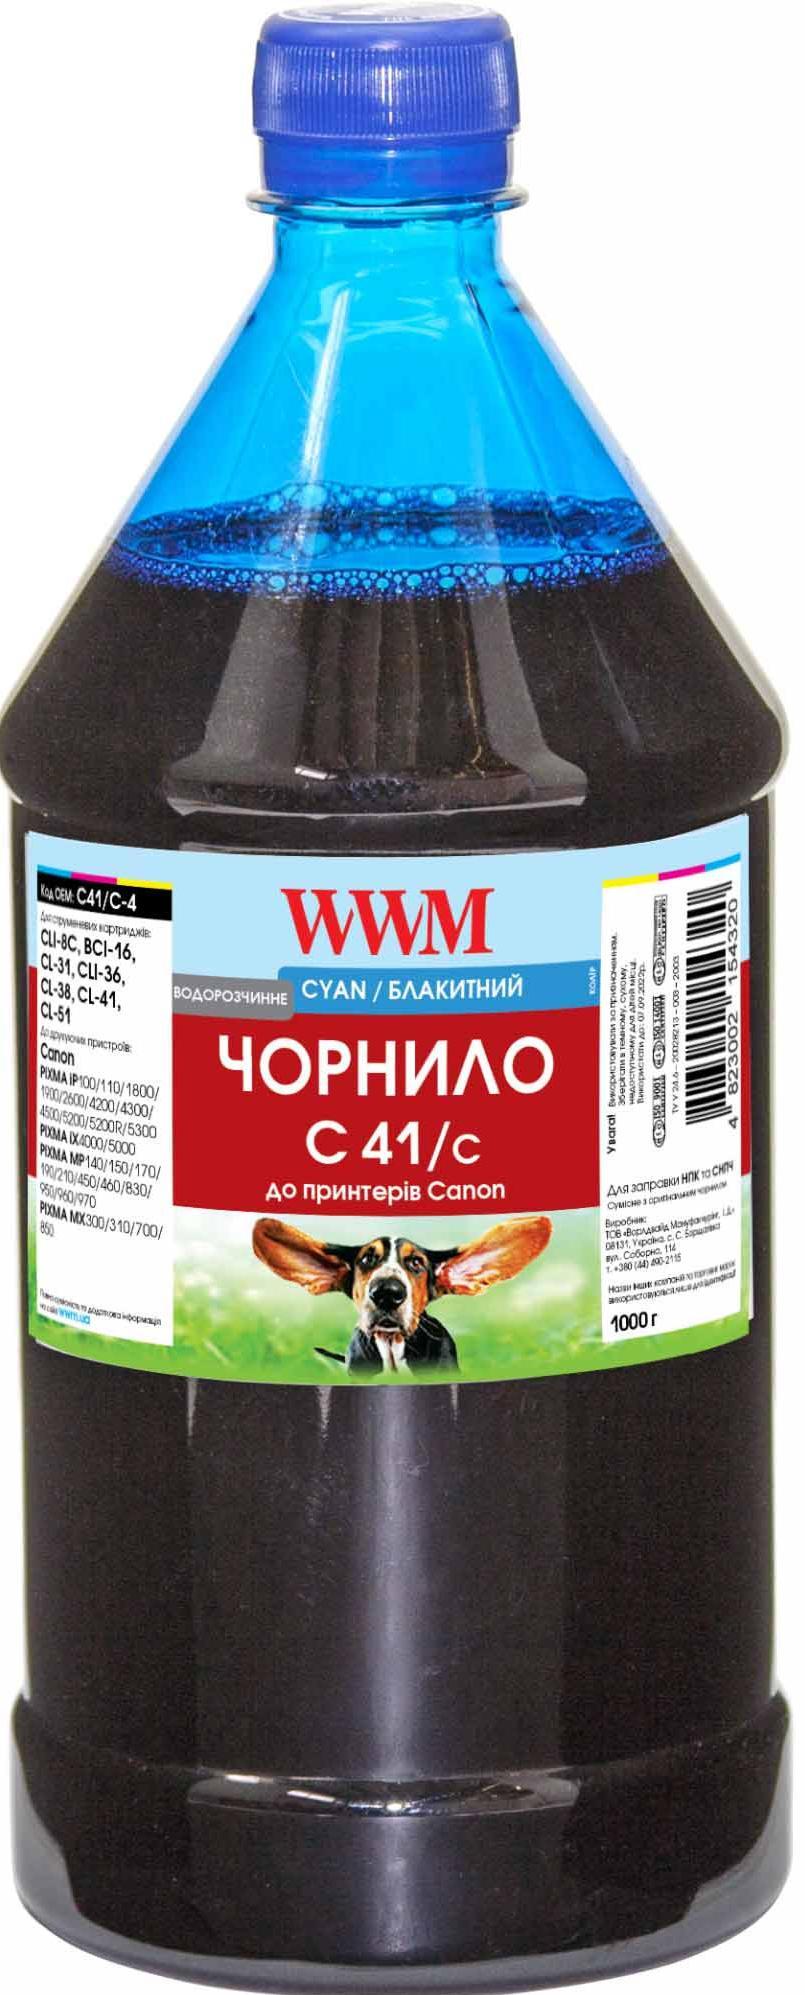 Купить Чорнило WWM for Canon CL-41C/CL-51C/CLI-8C - Cyan 1000g (C41/C-4)